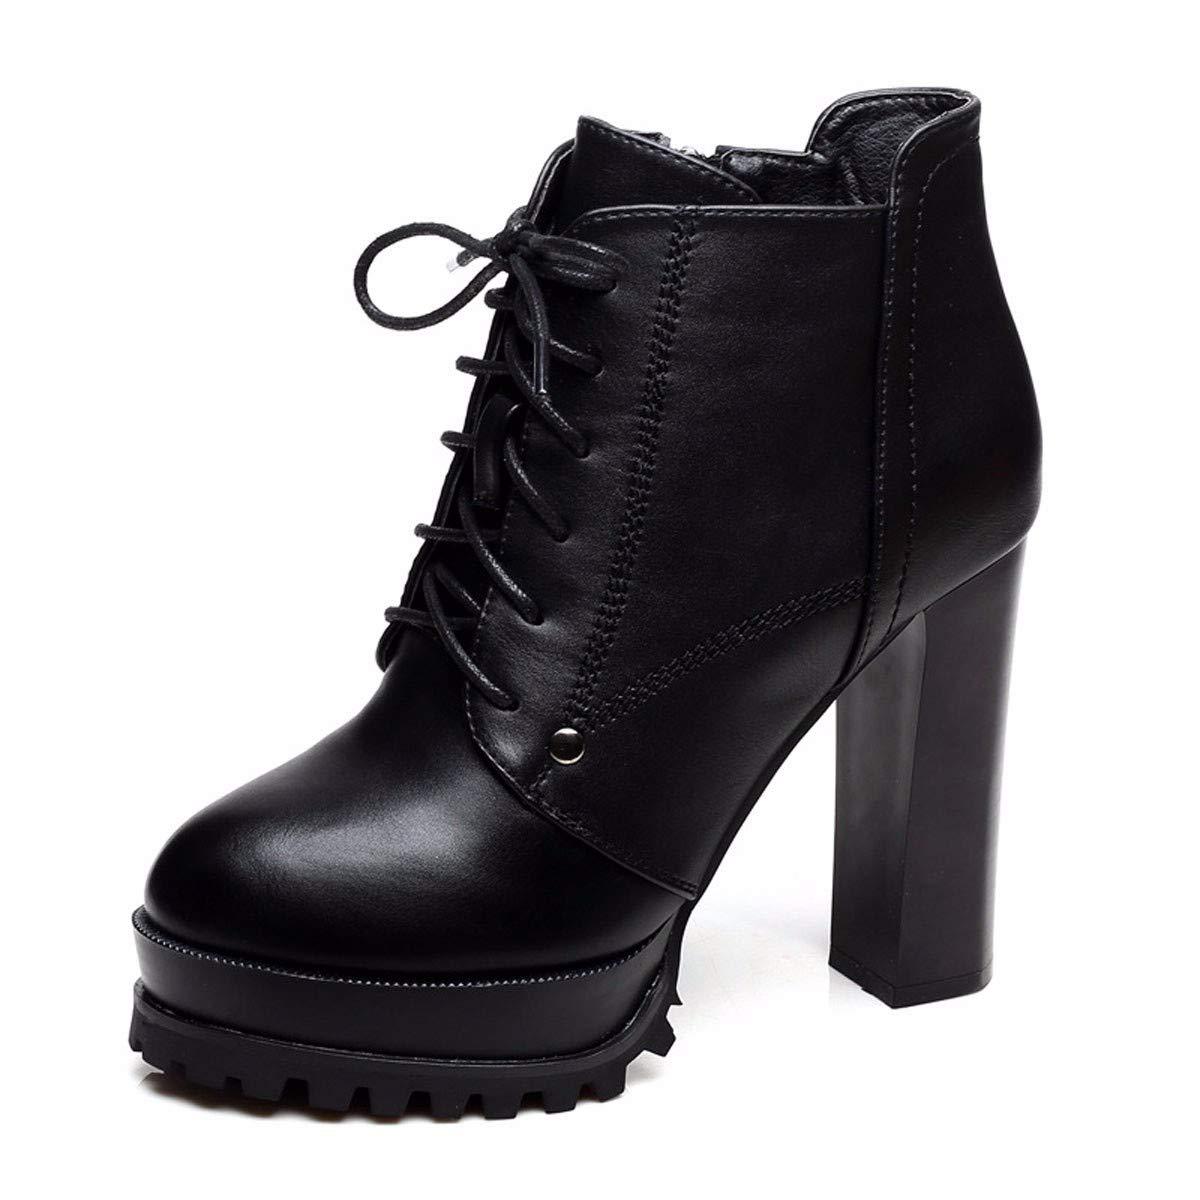 HBDLH Damenschuhe Kurze Stiefel High 11Cm Wasserdicht - Plattform Frenulum Dicke Sohle Dicke Sohle High - Heel Ma Dingxue.